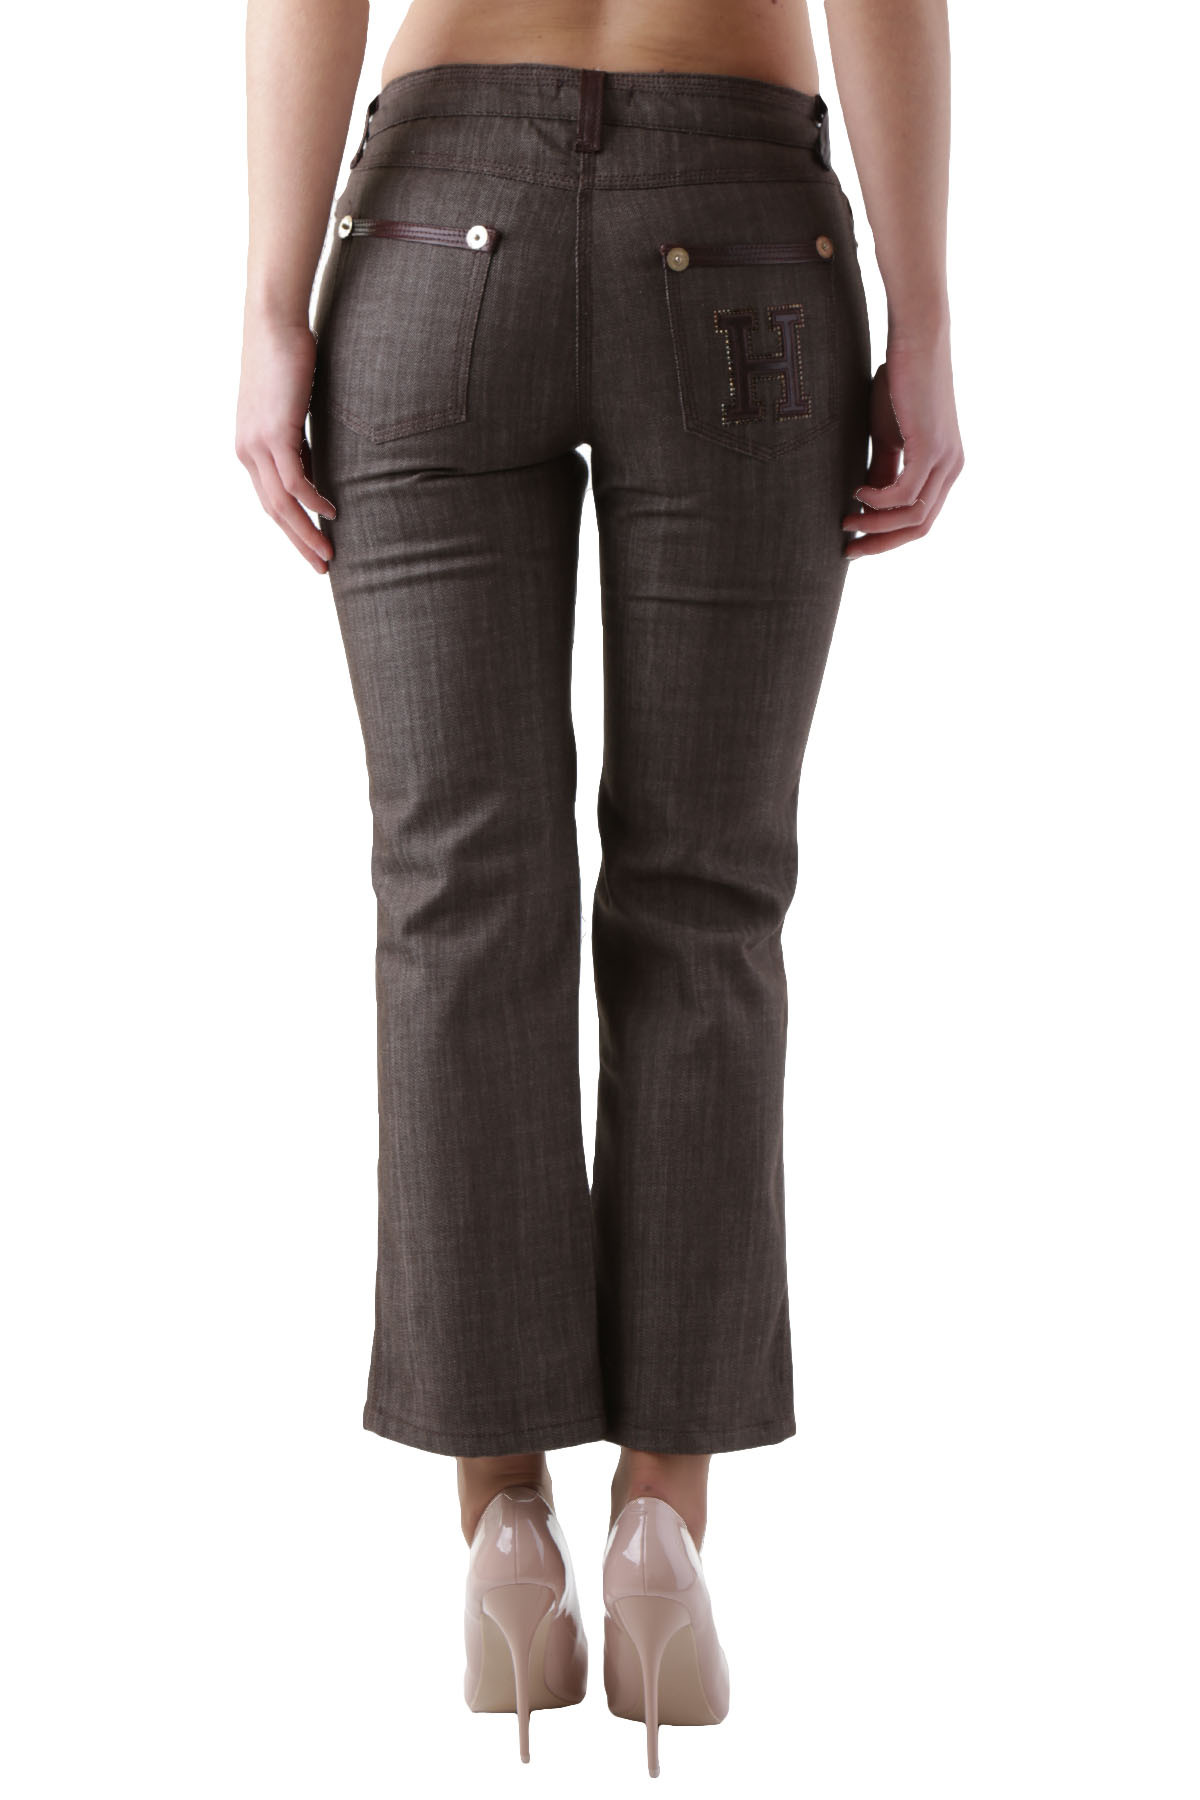 Husky Mujer Pantalones de Husky en Pantalones mujer ...